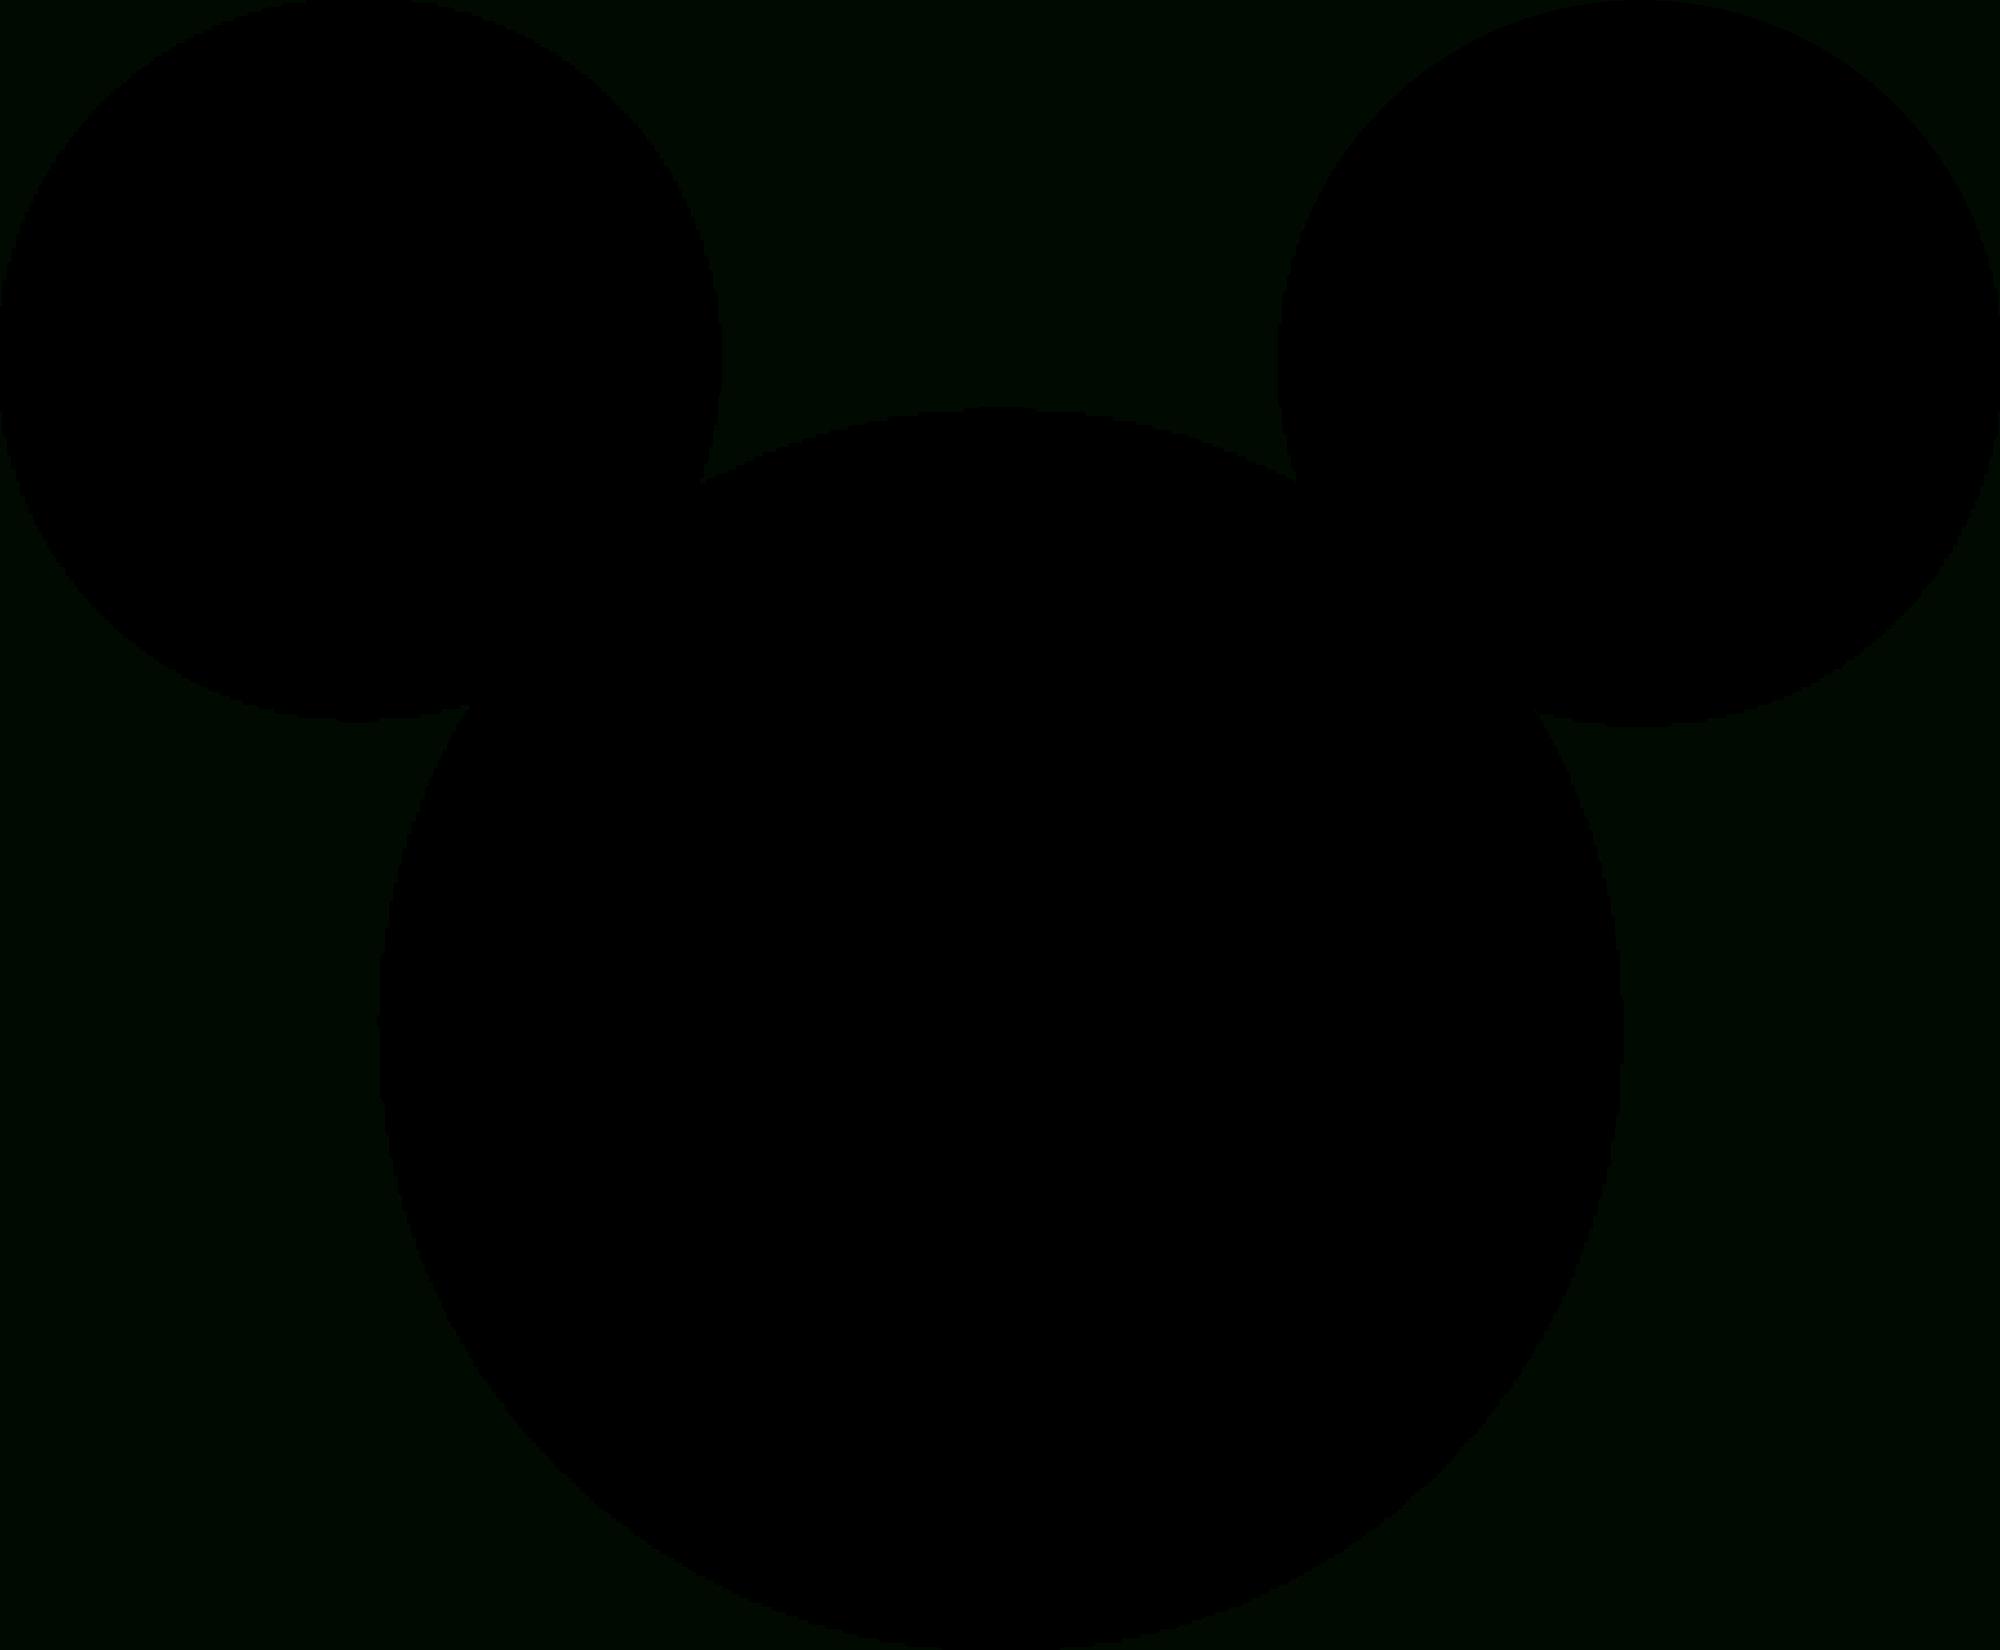 mickey mouse - wikipedia